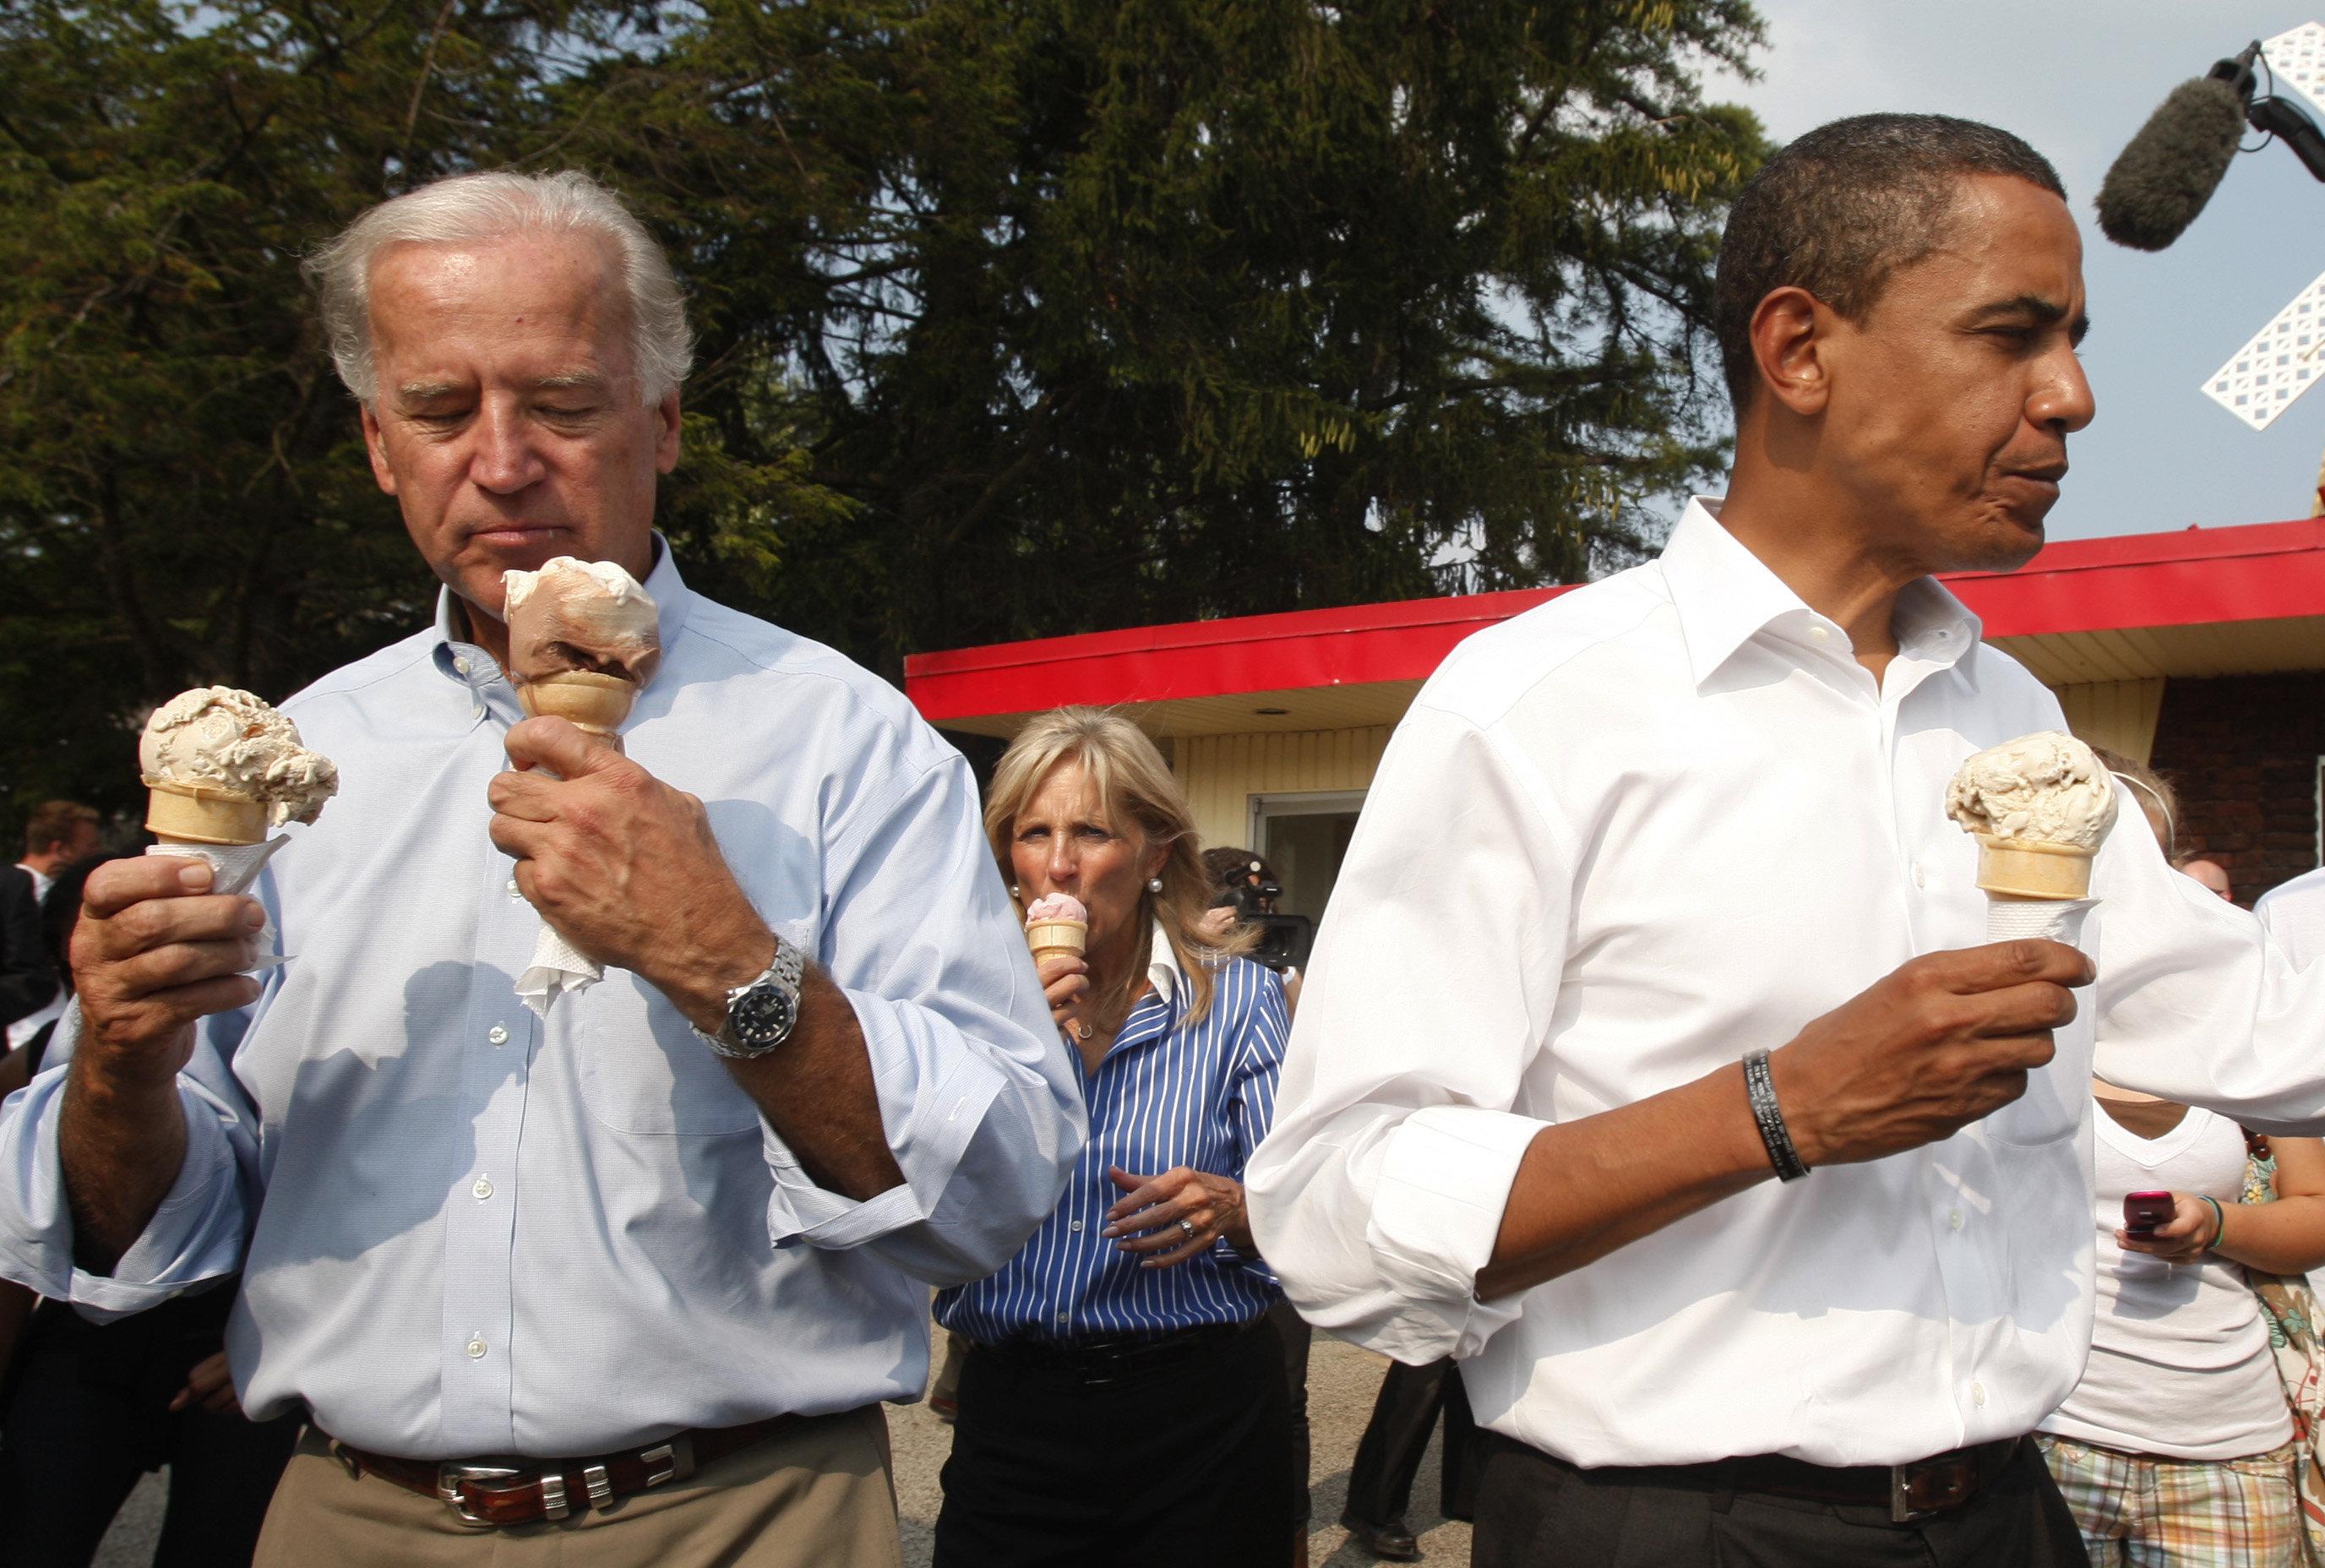 Ice cream lover Joe Biden is finally getting his own flavor Ice cream lover Joe Biden is finally getting his own flavor new pics